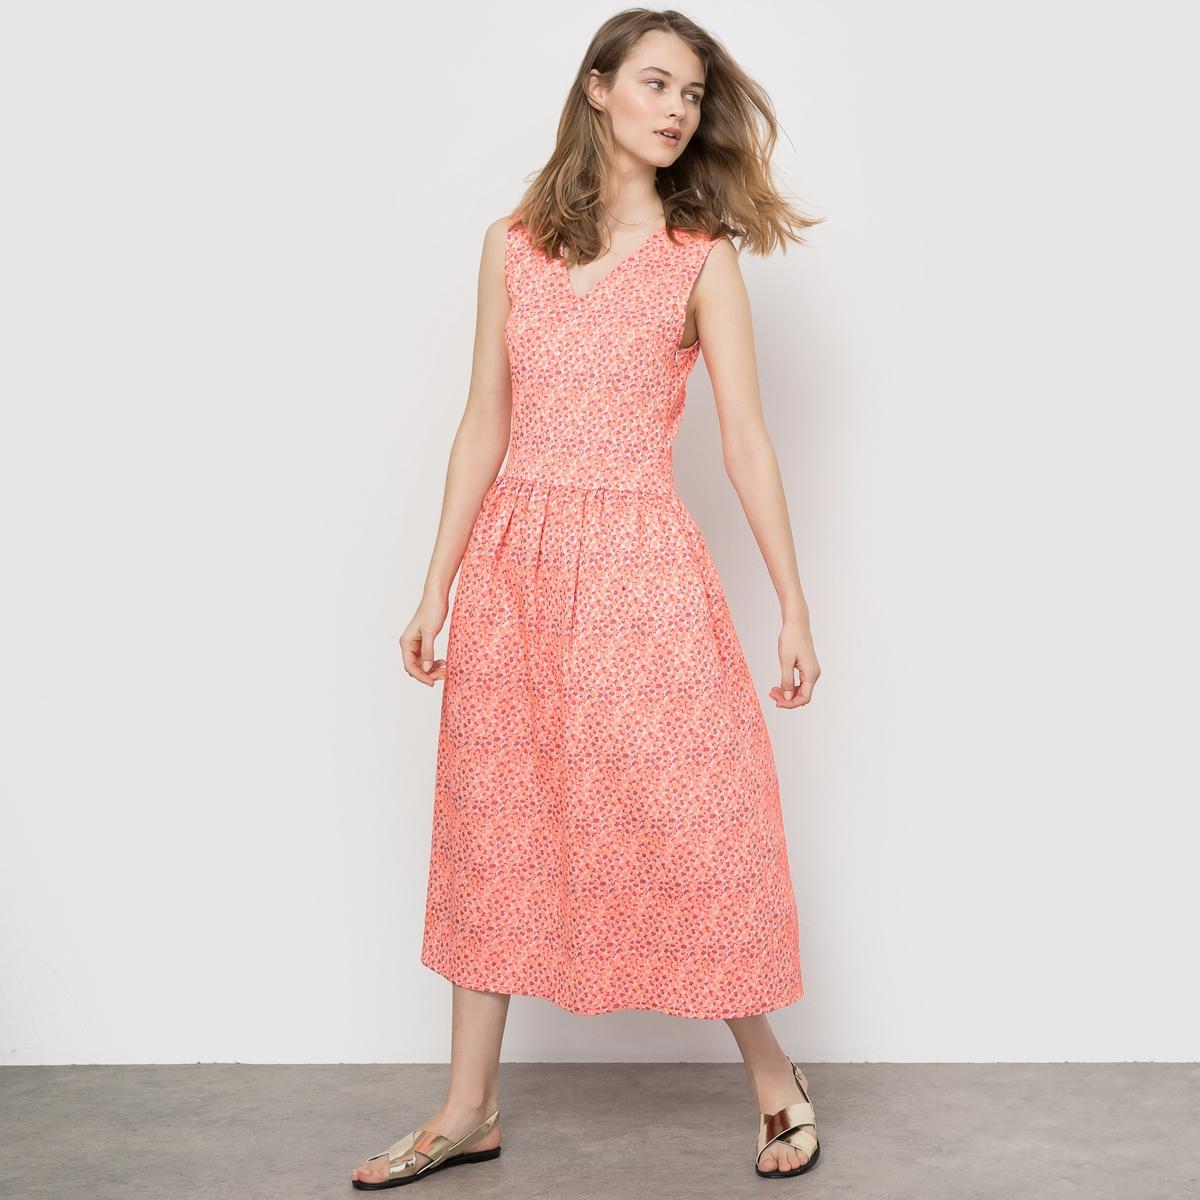 Платье жаккардовоеСостав и описаниеМатериал : 87% полиэстера, 12% хлопка, 1% эластана.Длина :ок. 115 см.Марка : MADEMOISELLE R<br><br>Цвет: жакард<br>Размер: 40 (FR) - 46 (RUS).36 (FR) - 42 (RUS)